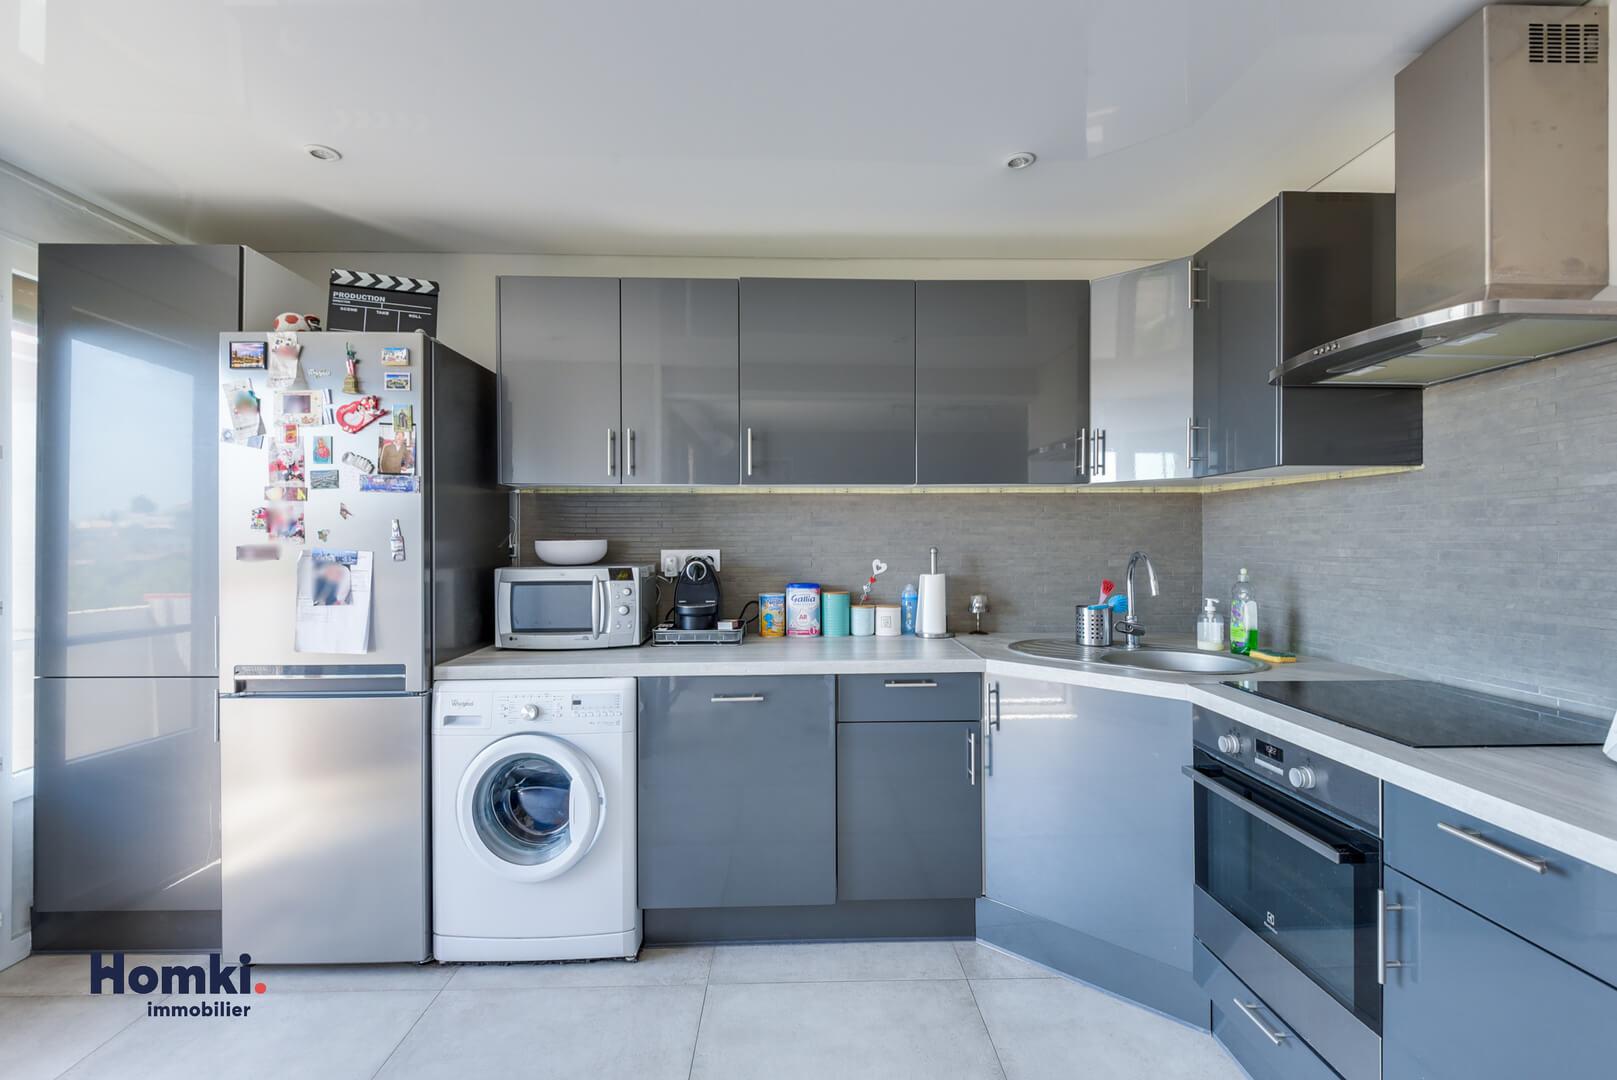 Vente Appartement 72 m² T3 13014 Marseille_4